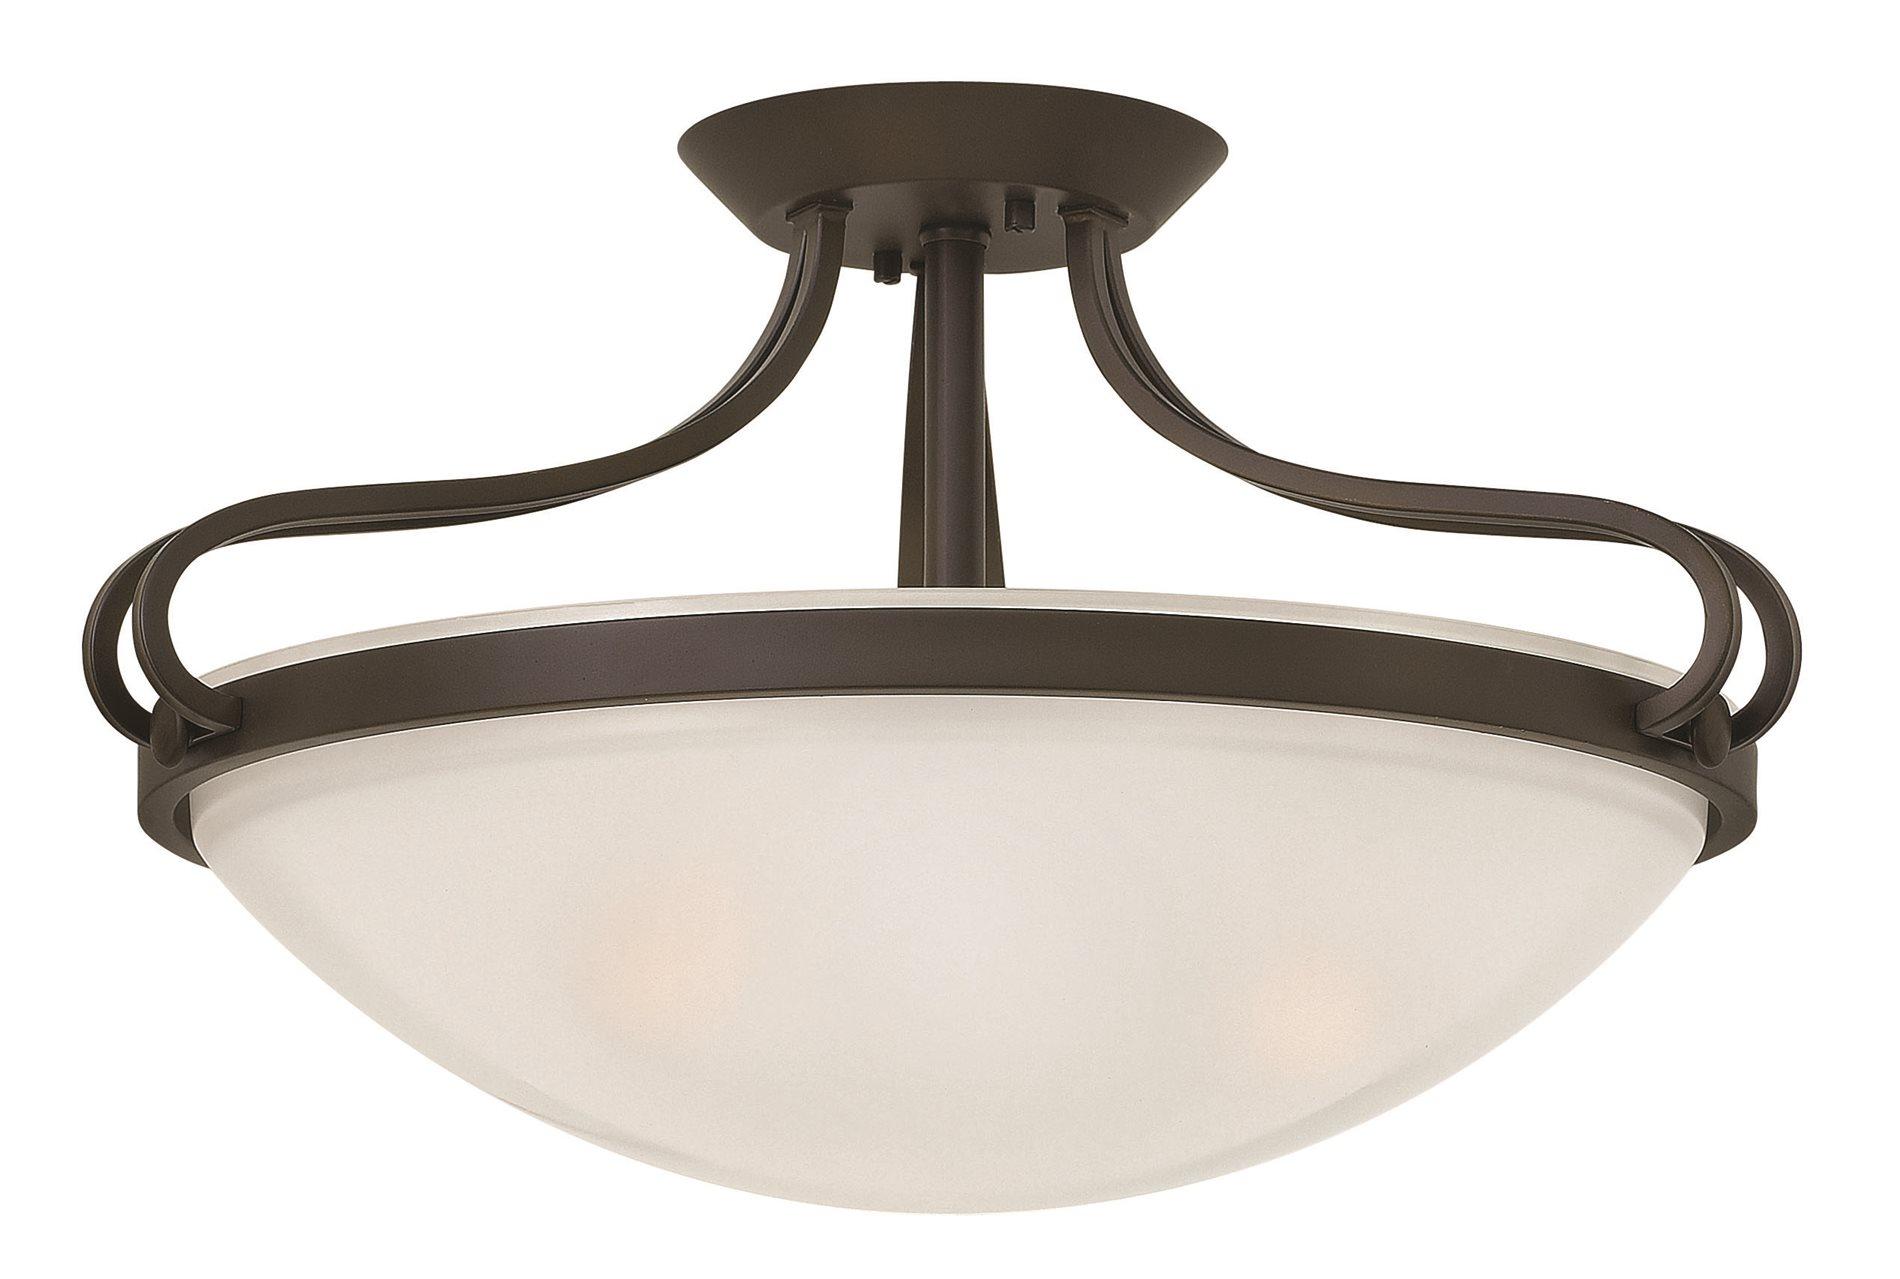 Hinkley Lighting Paxton Foyer Light X-BO1383